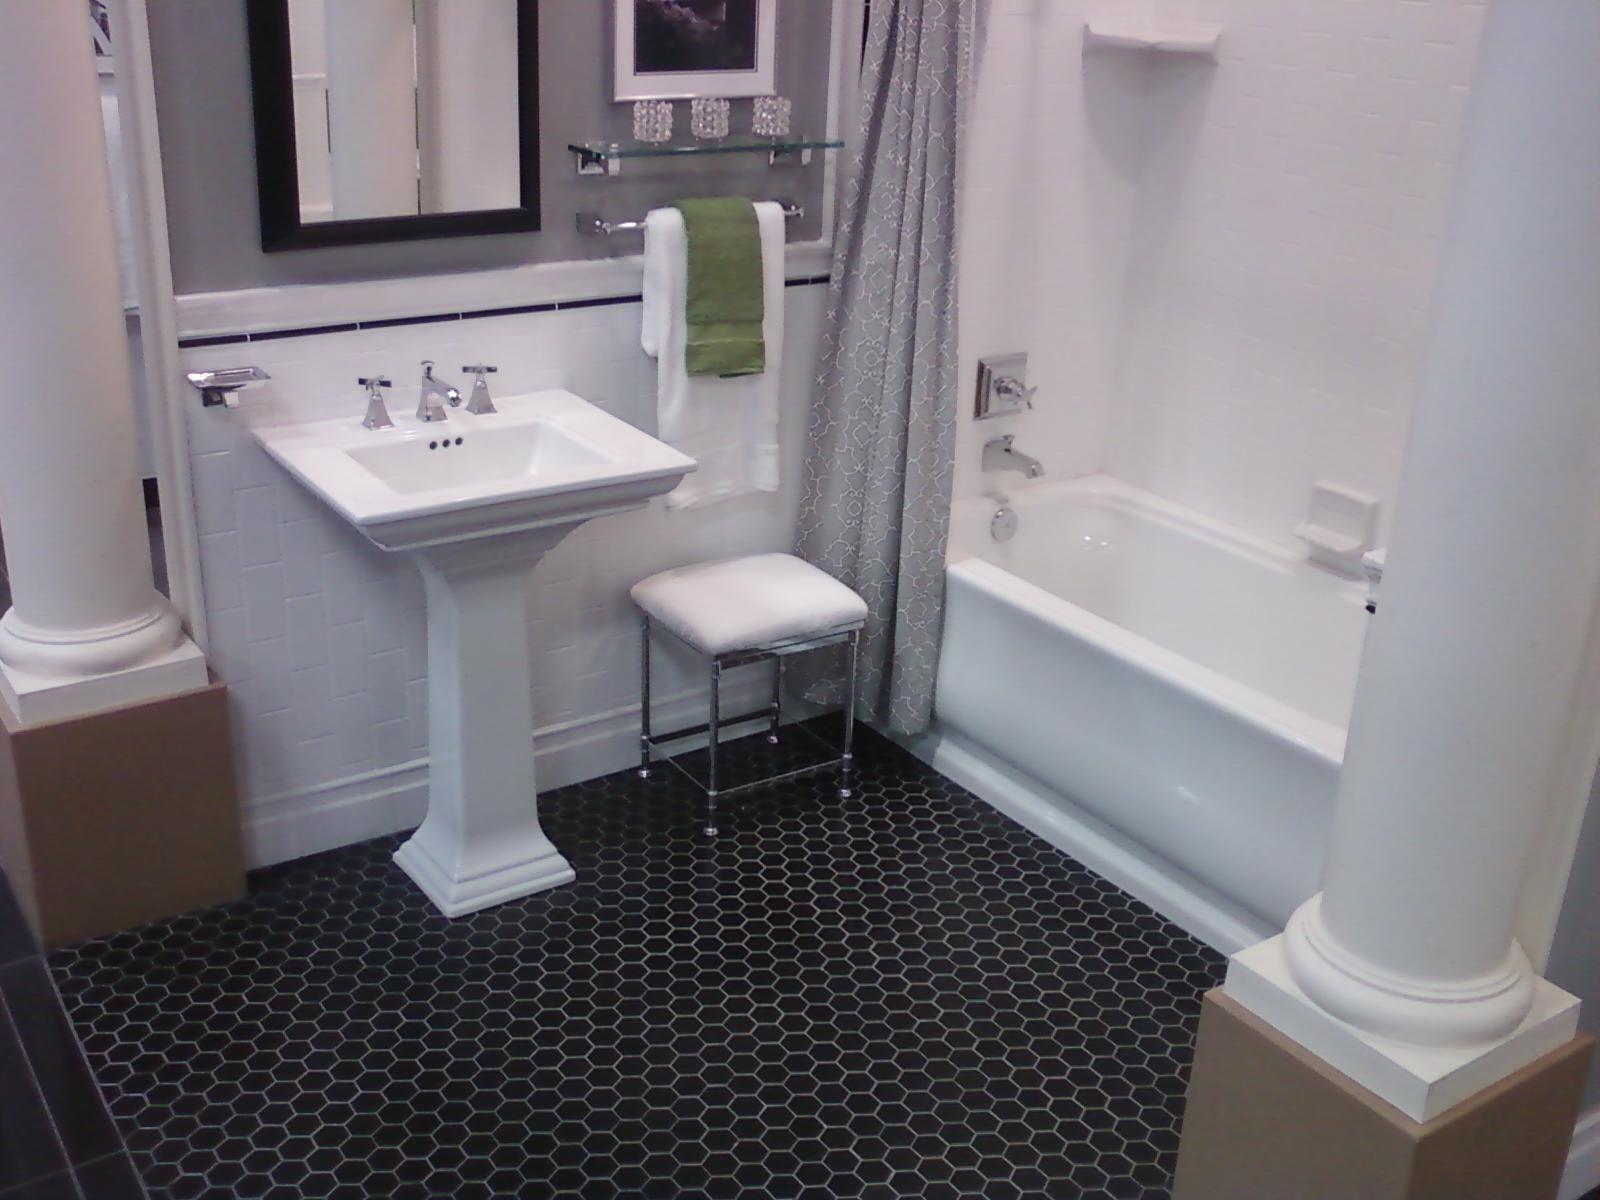 Fresh Hexagon Bathroom Tile Pics - eccleshallfc.com